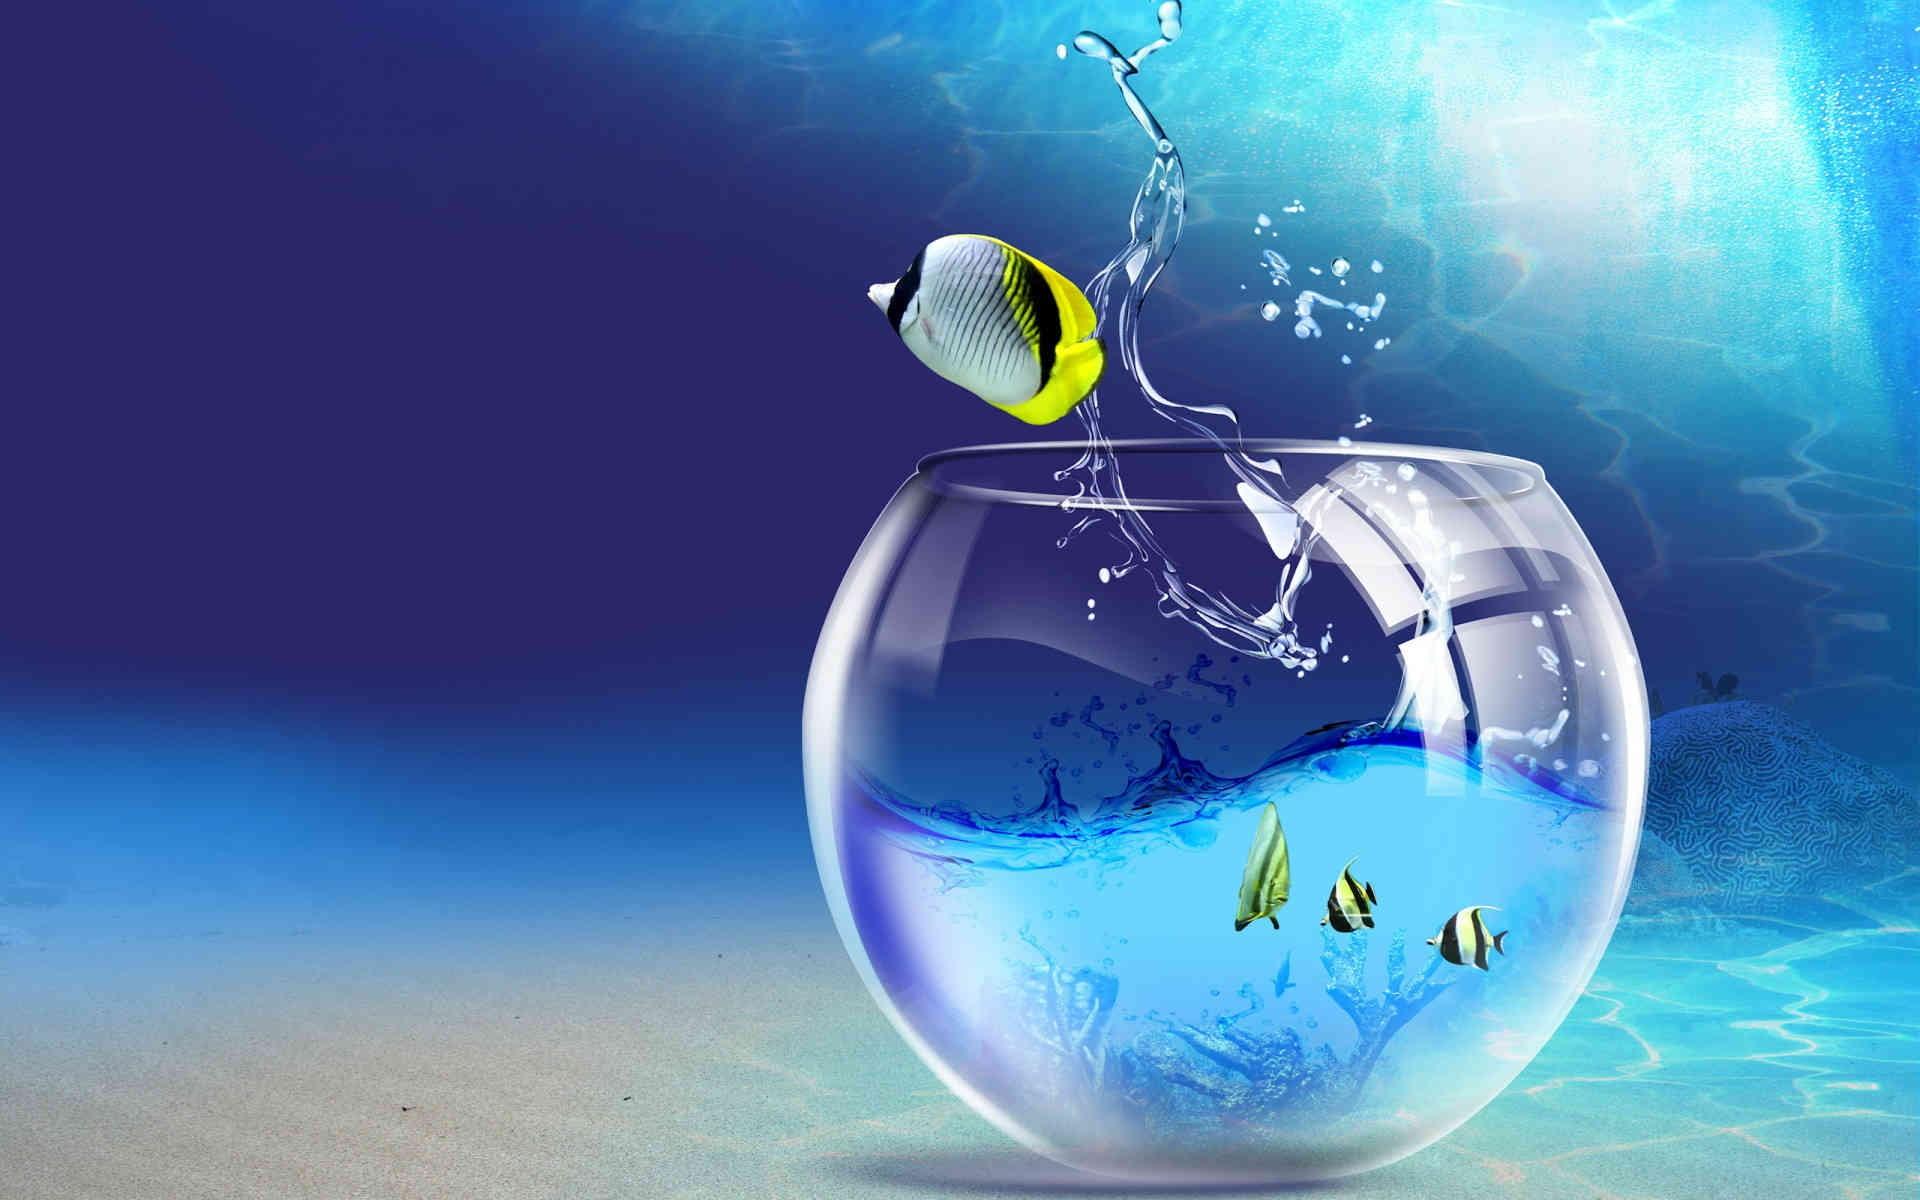 Beautiful-Fish-Free-Download-HD-Pop-wallpaper-wp3402999